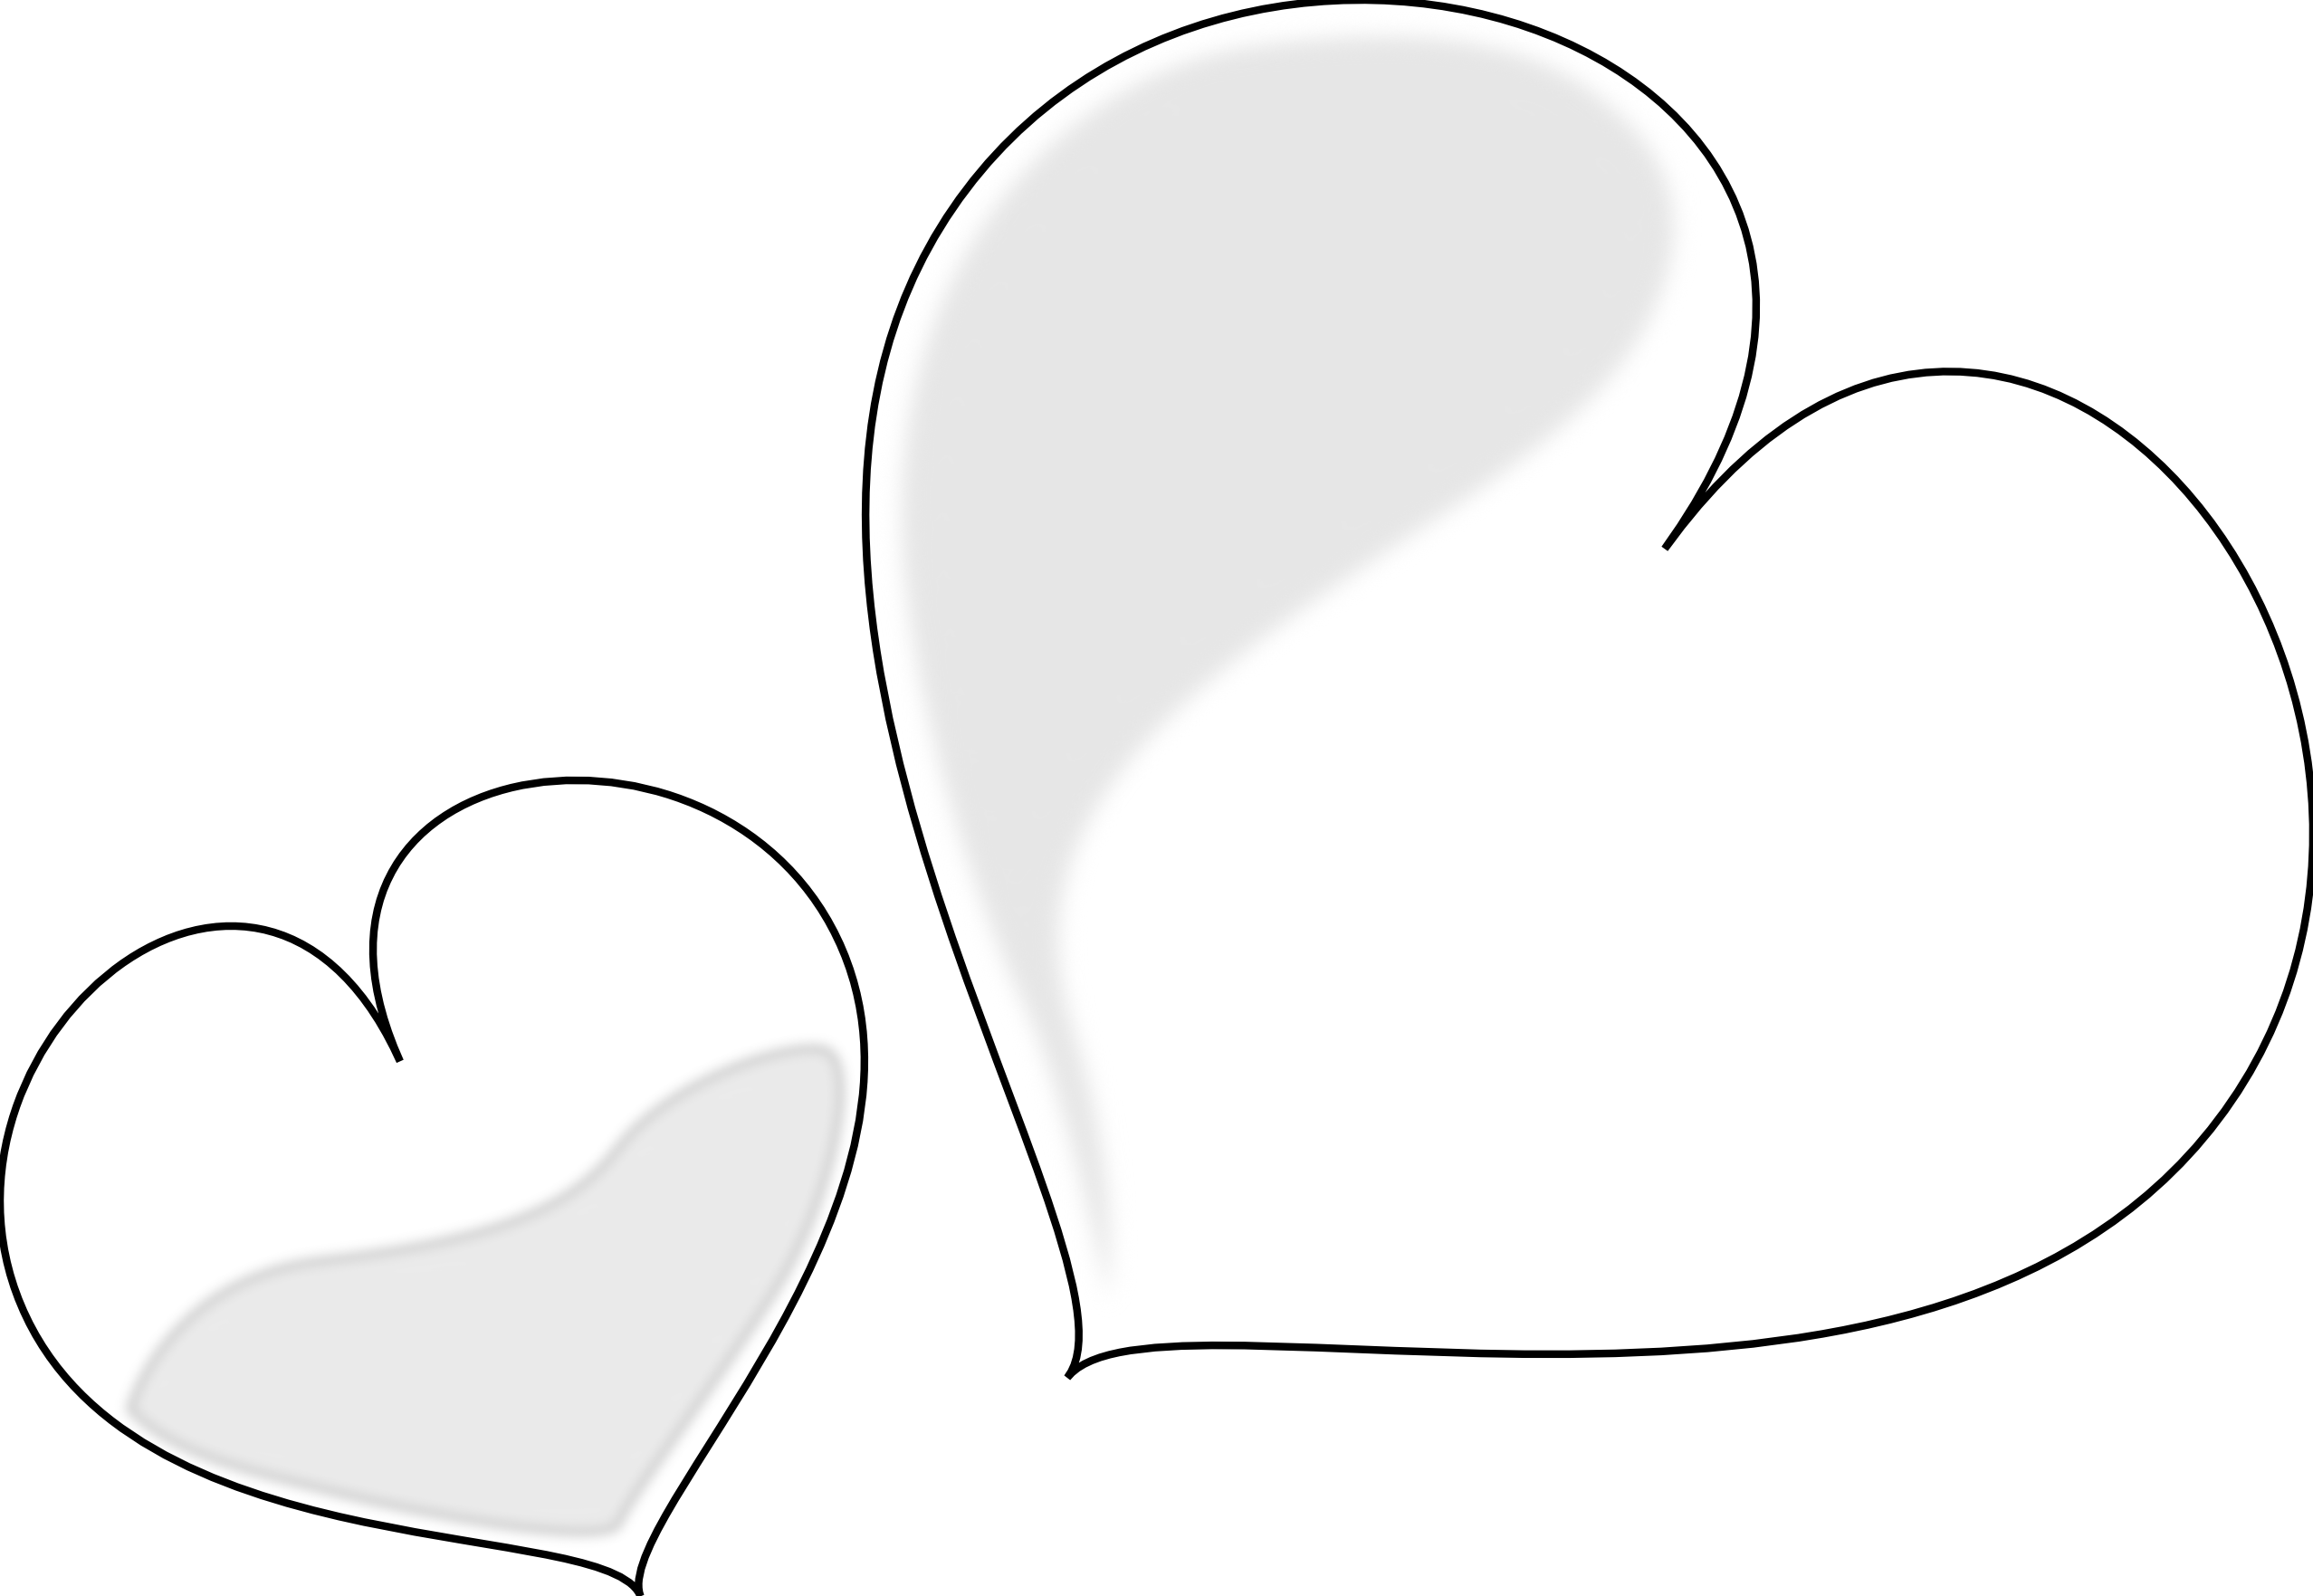 Heart black and white heart clipart black and white clip art heart.